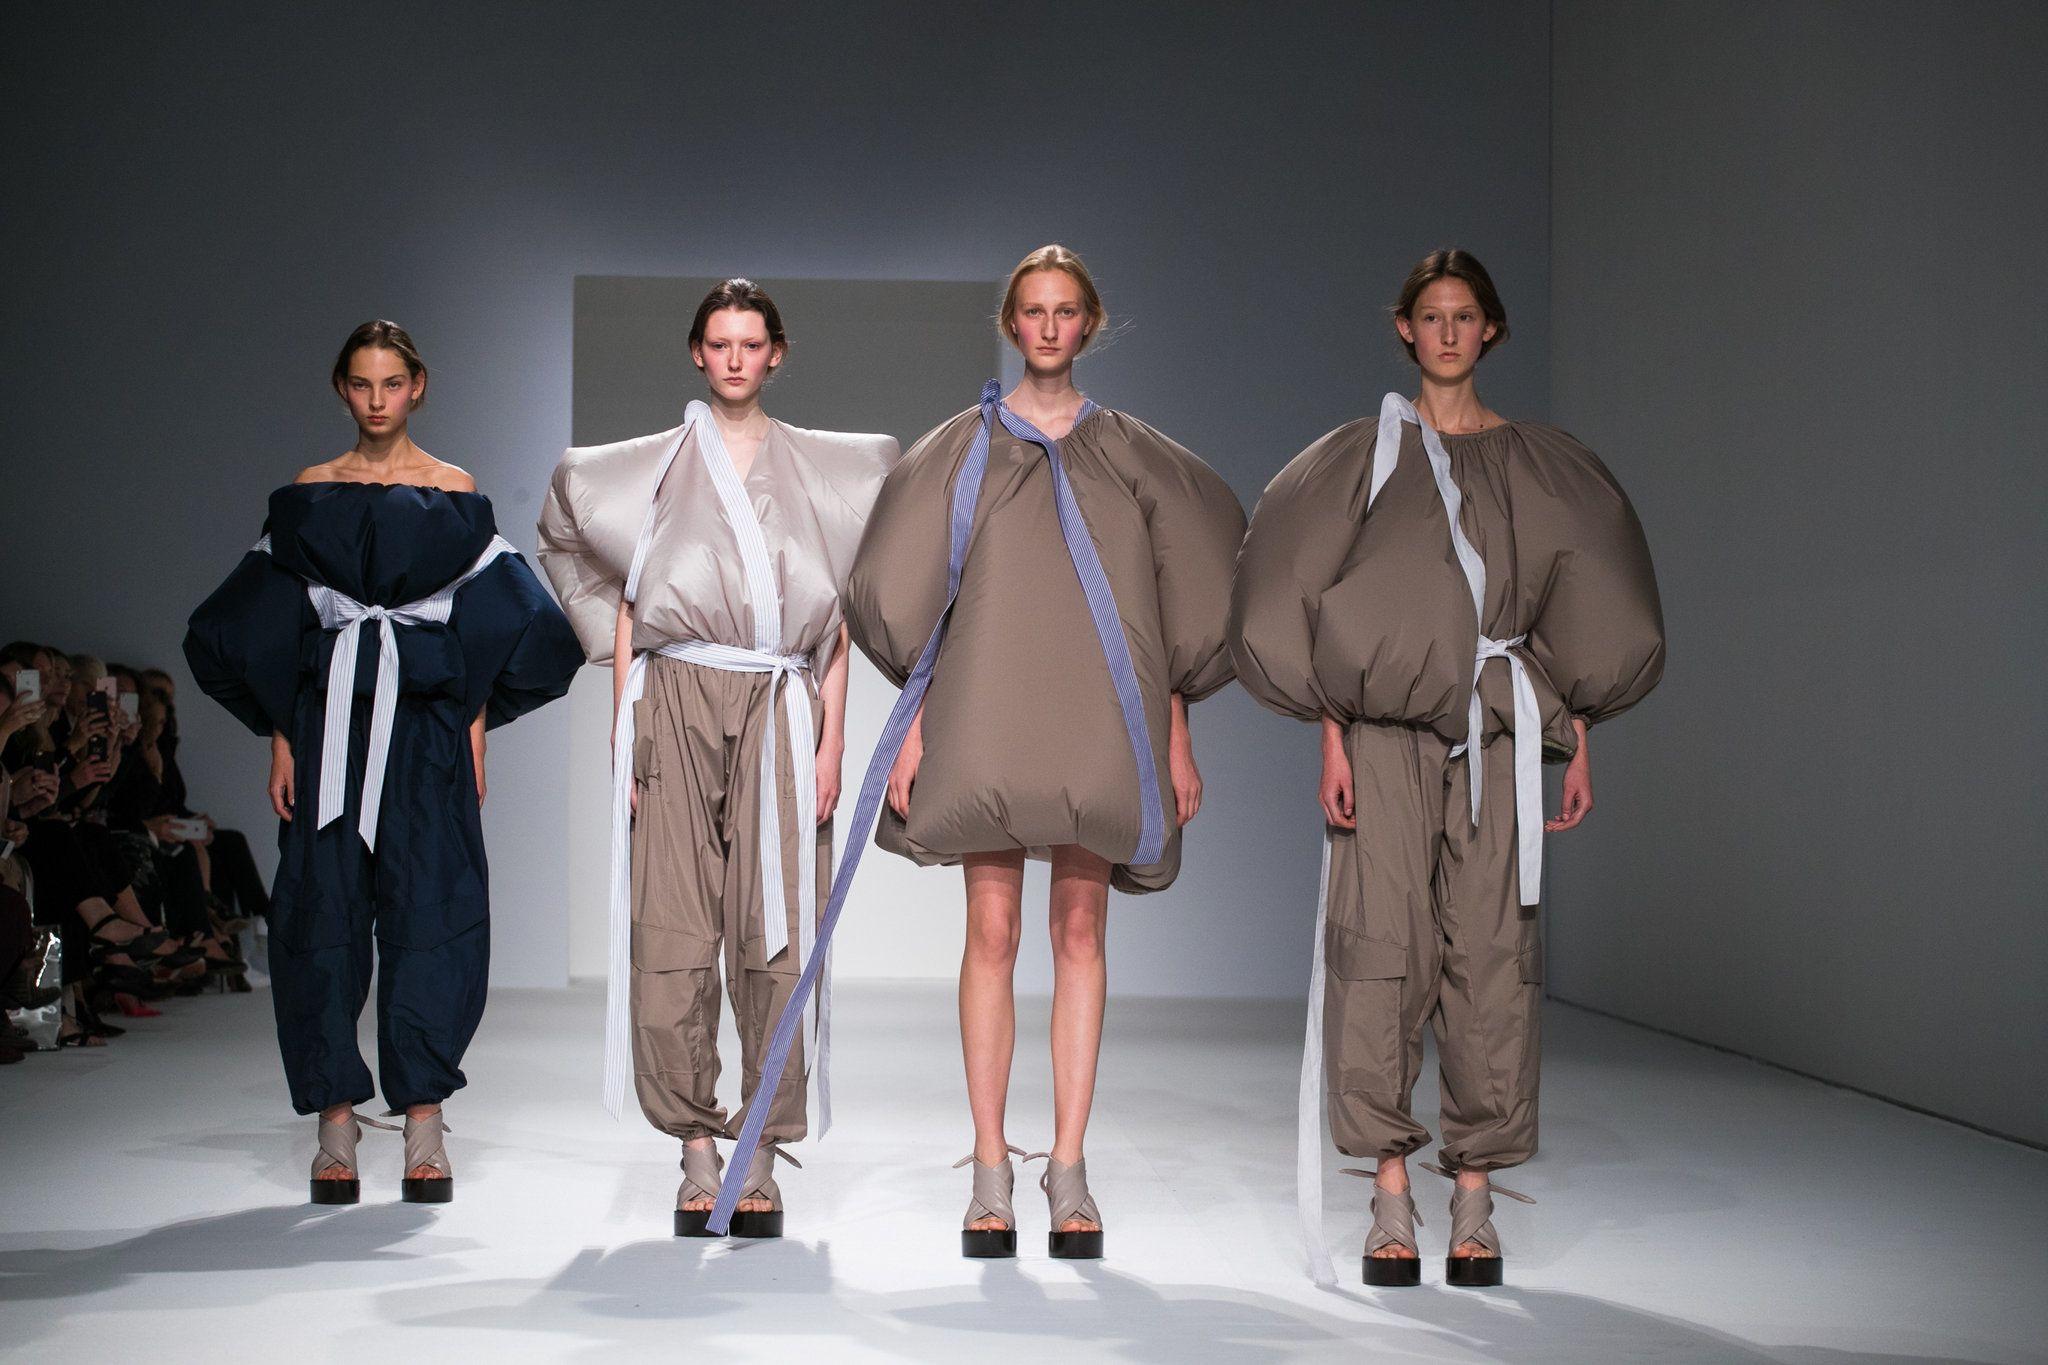 Paris Fashion Week Photos Rick Owens Balmain And More Fashion Fashion Week Photos Paris Fashion Week